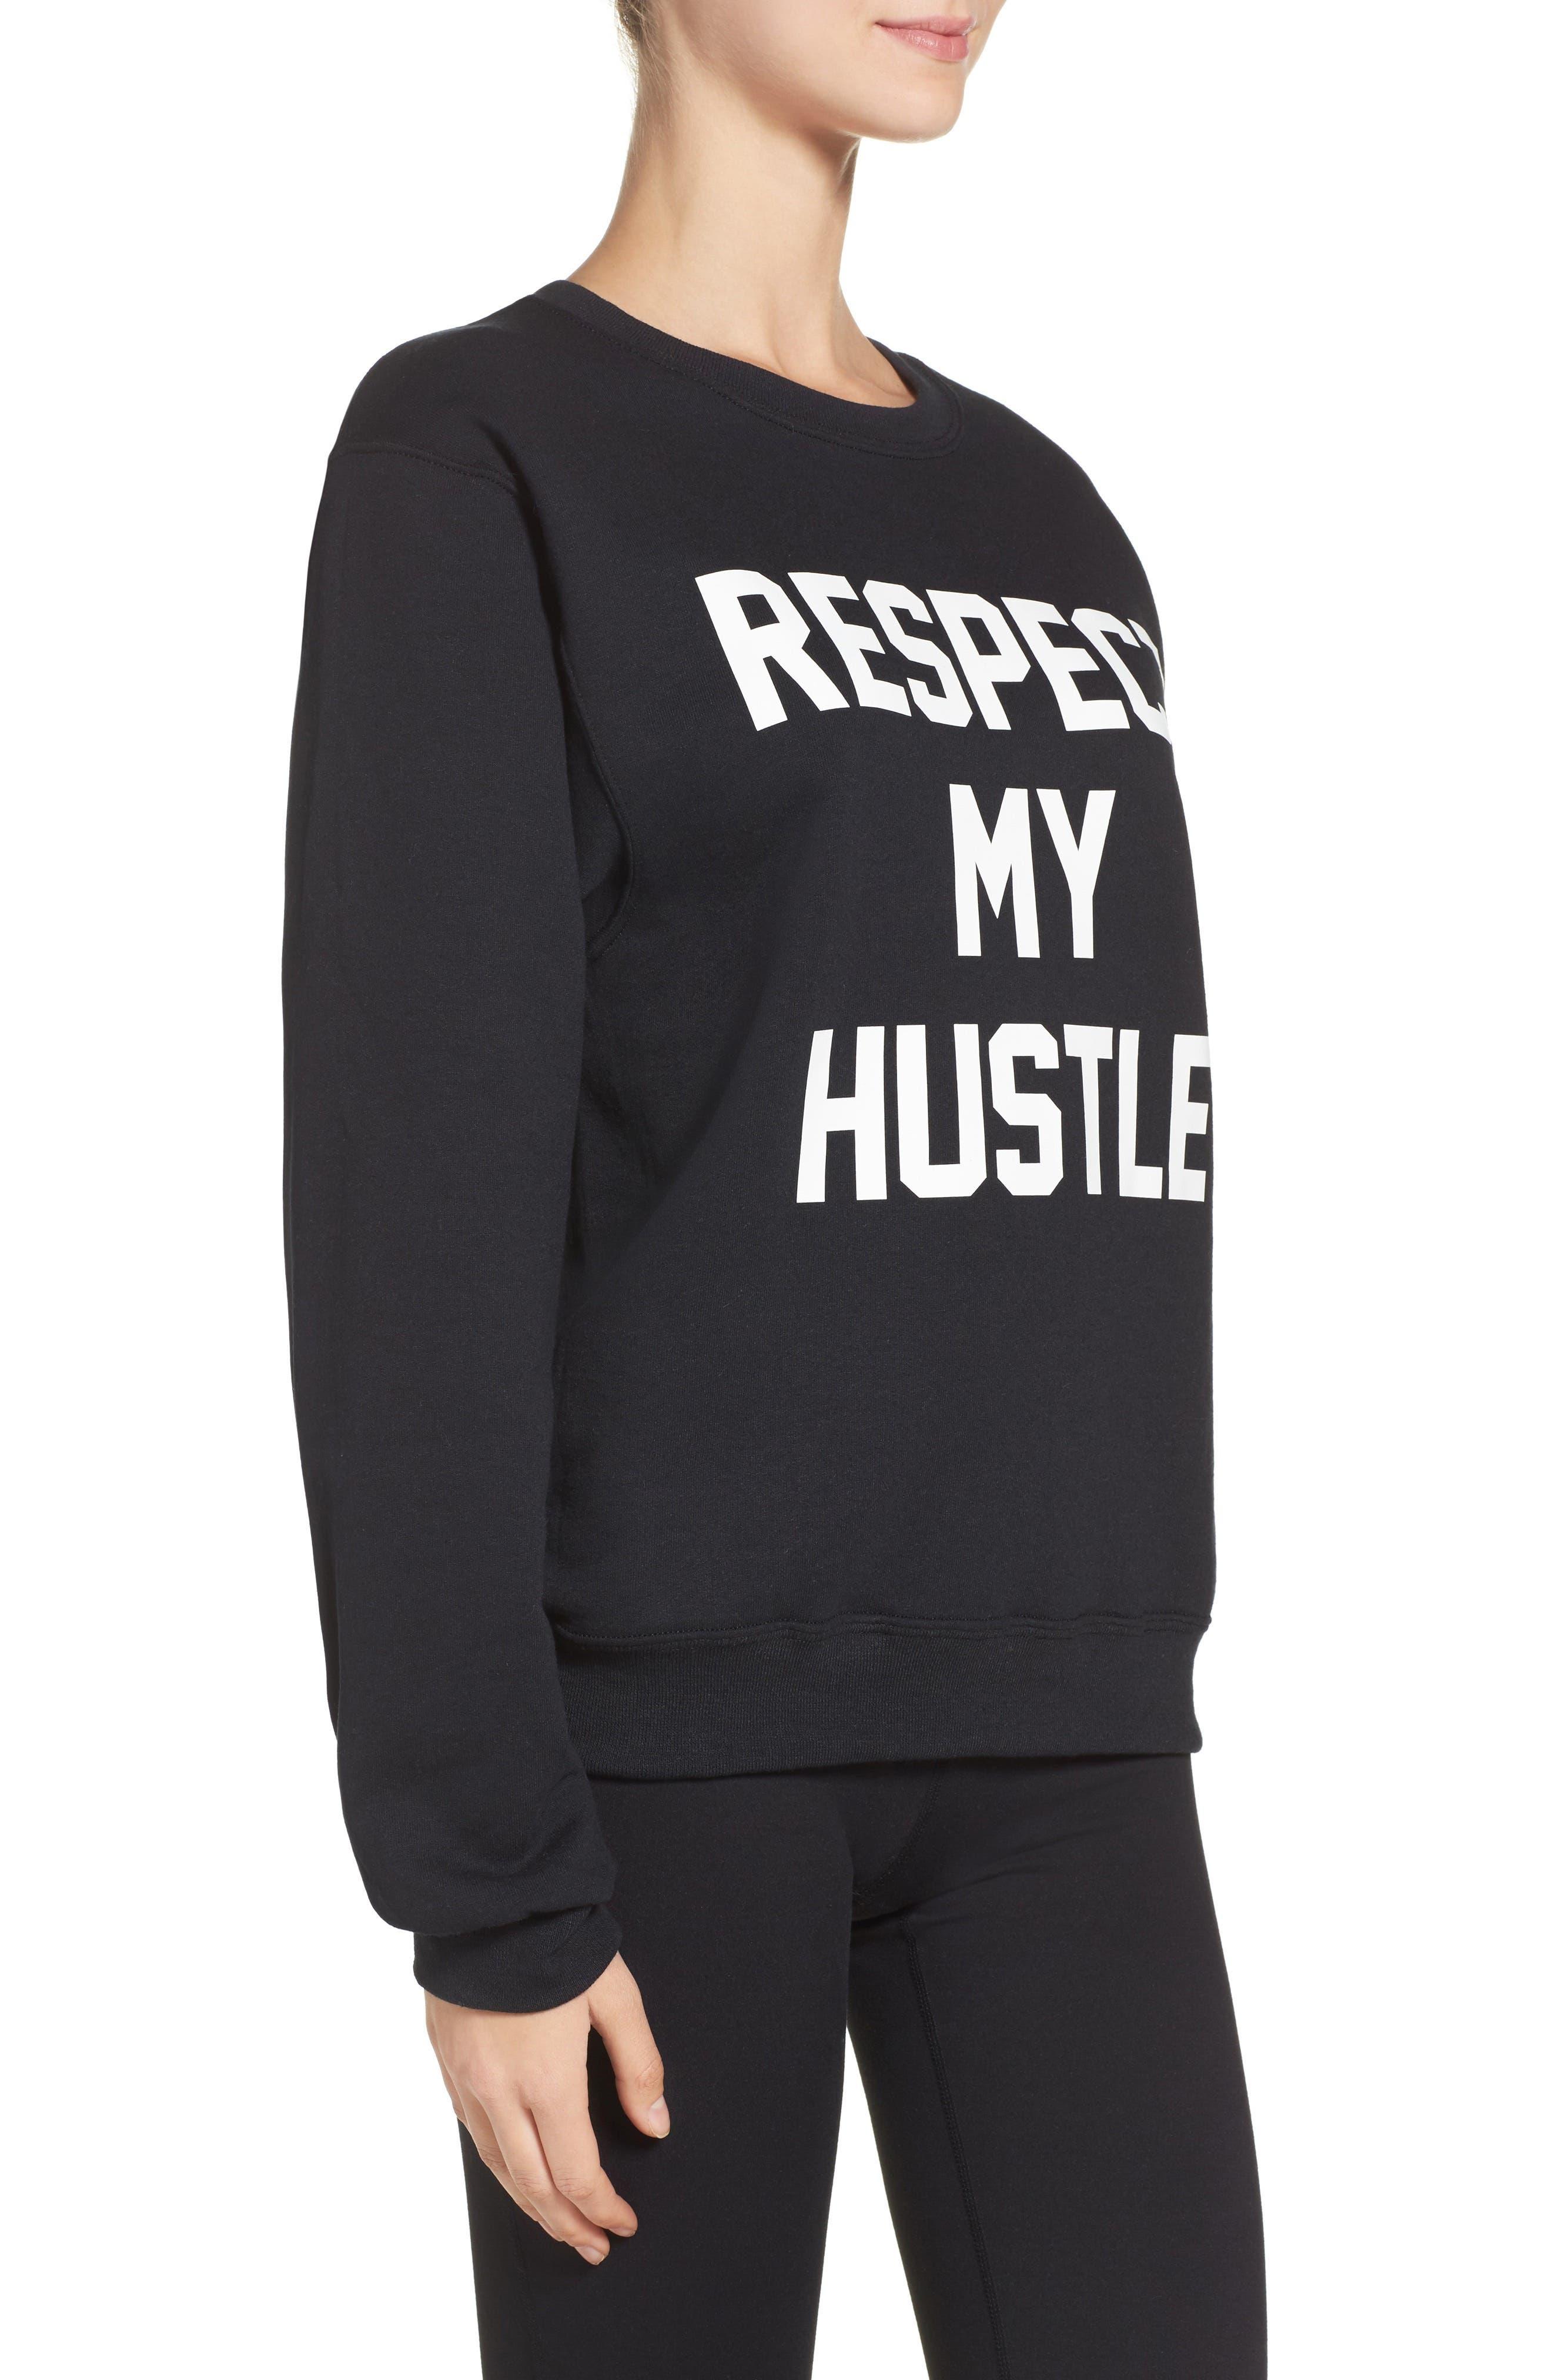 Respect My Hustle Sweatshirt,                             Alternate thumbnail 3, color,                             001